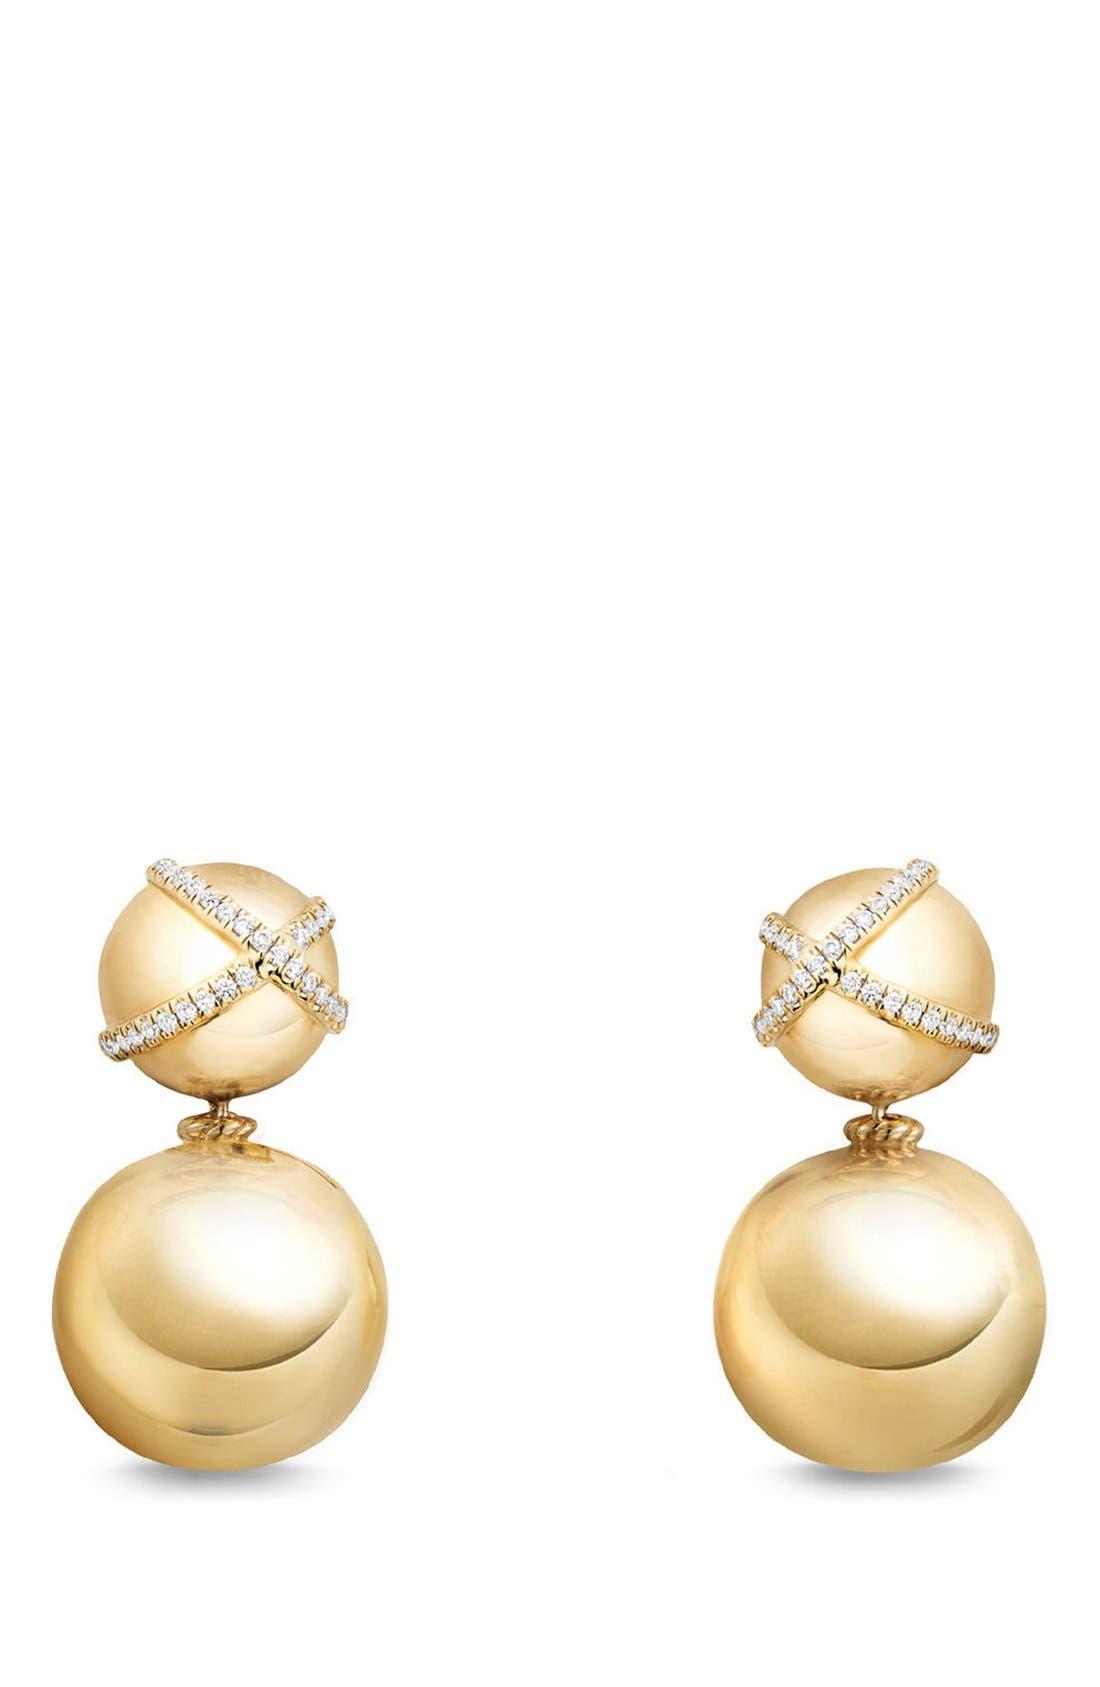 David Yurman 'Solari' Pavé Wrap Double Drop Earrings with Diamonds in 18K Gold